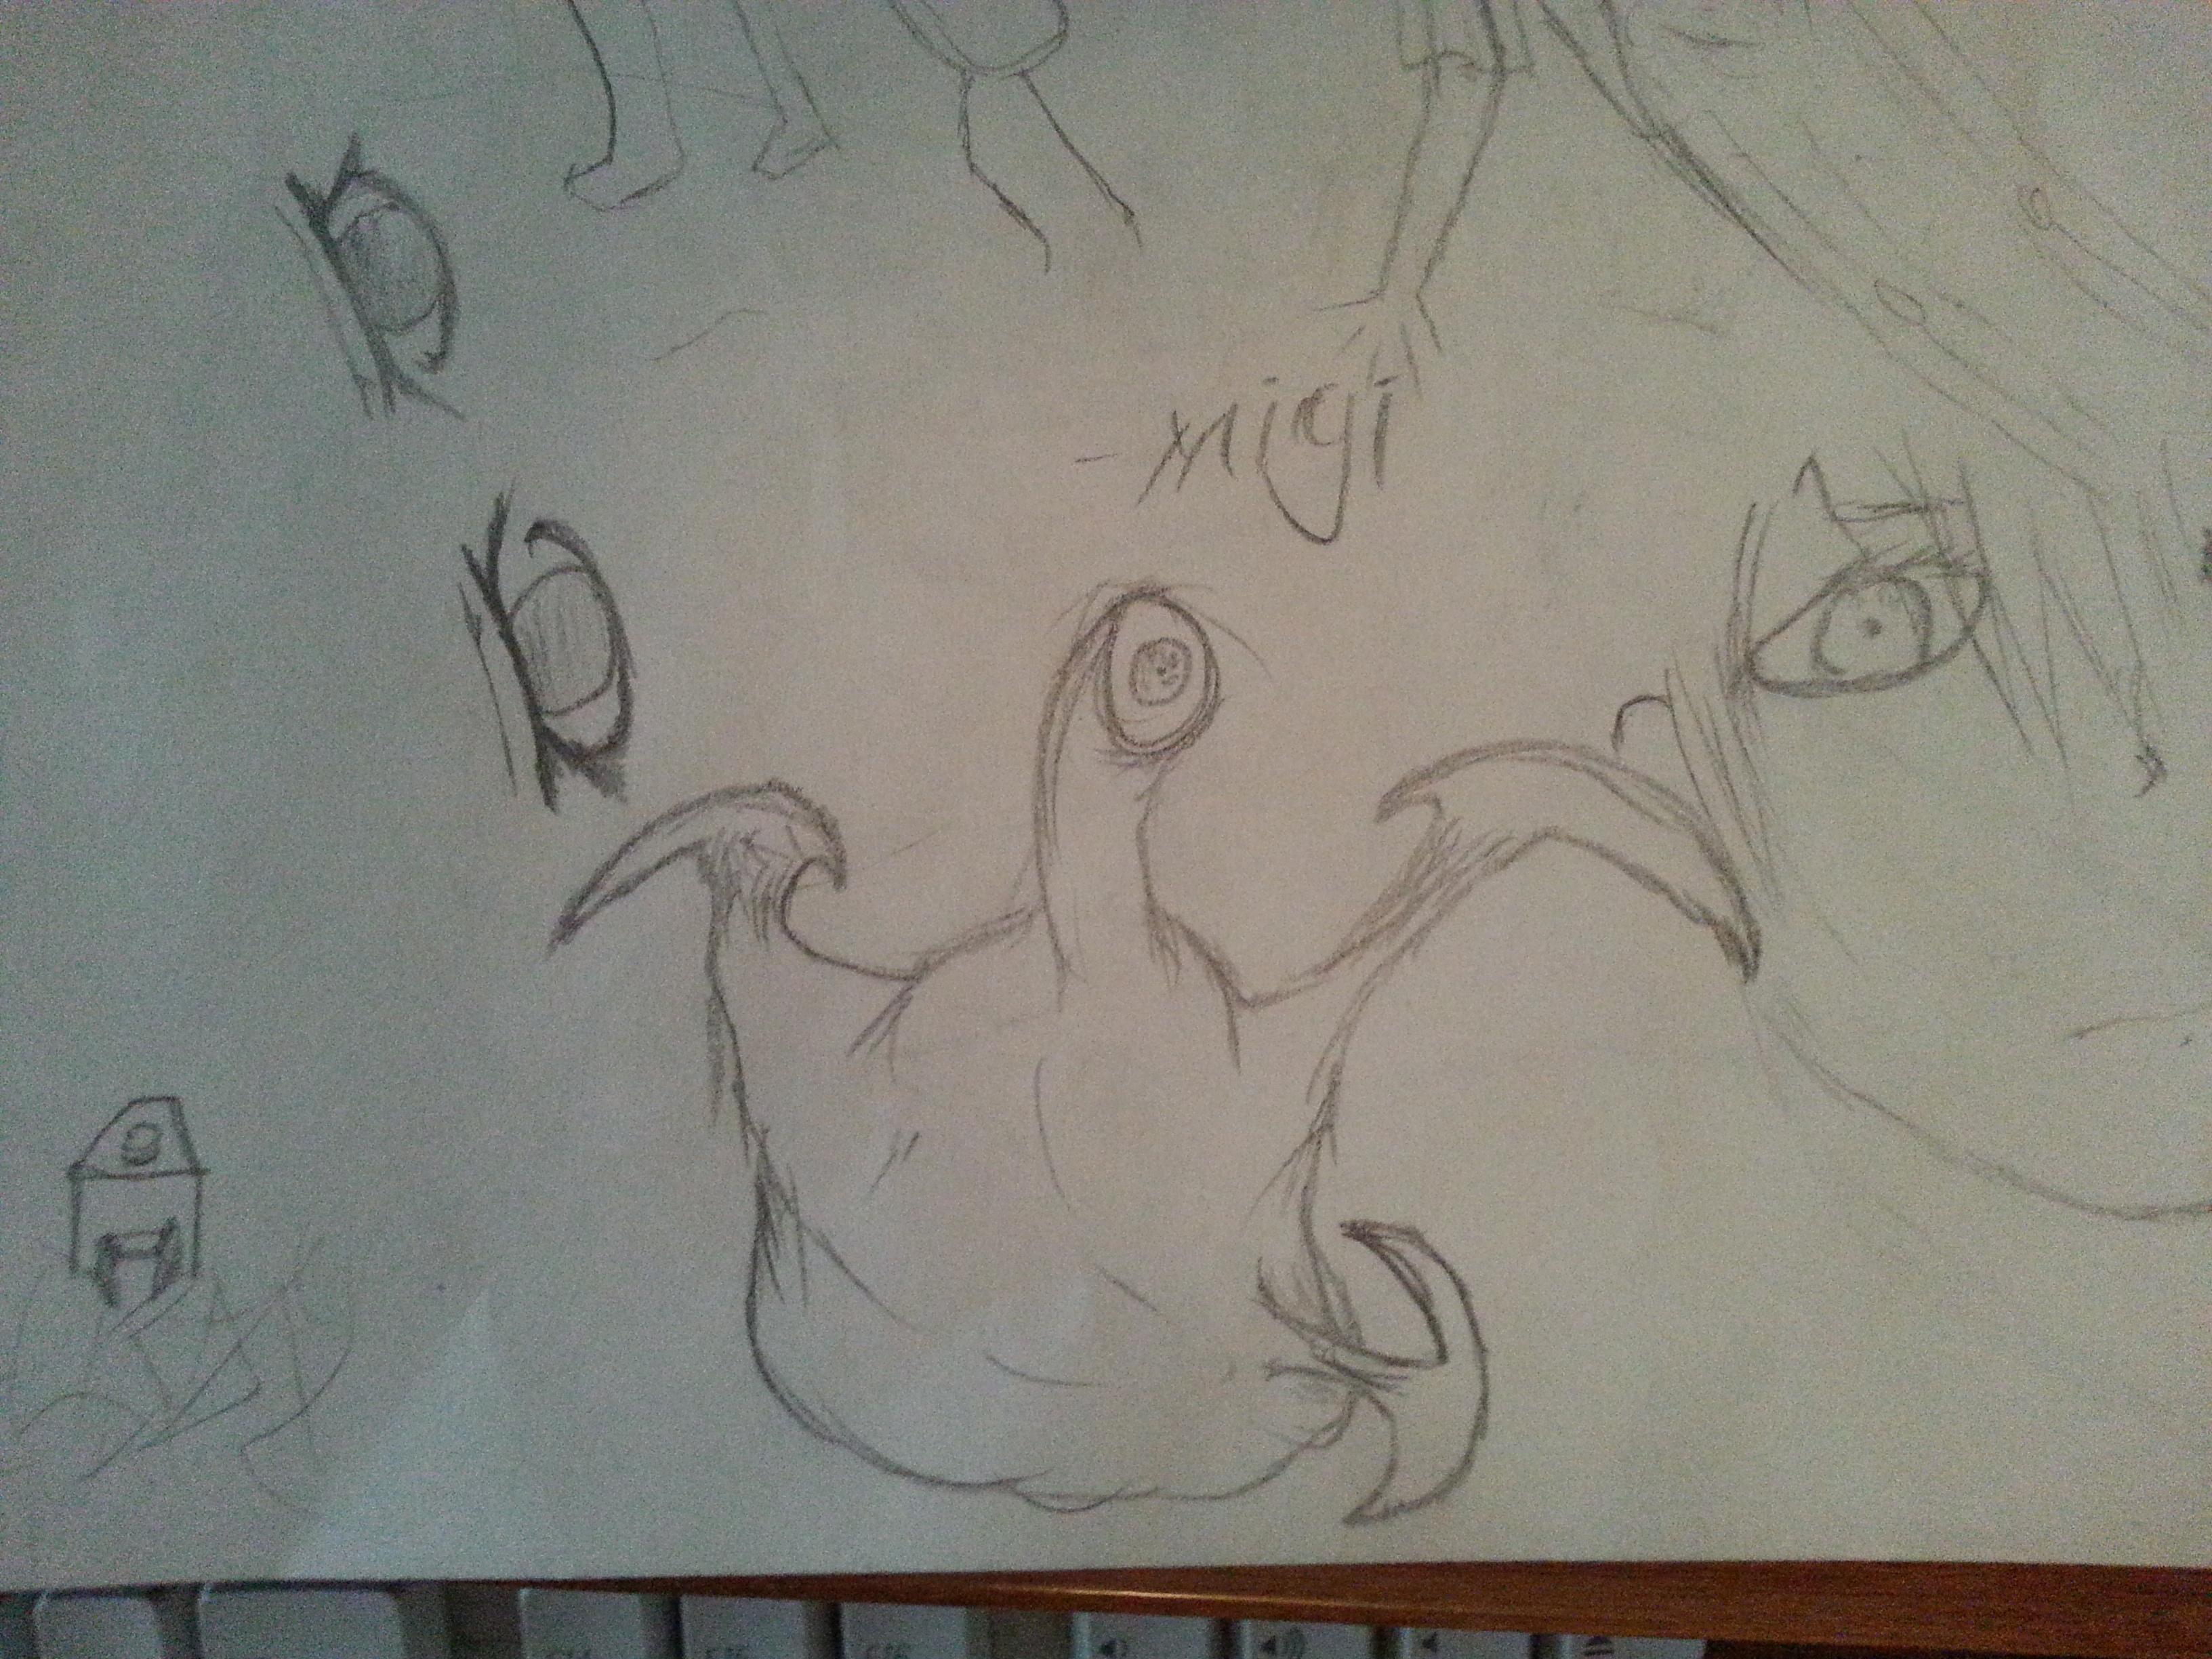 Migi from parasyte- the maxim